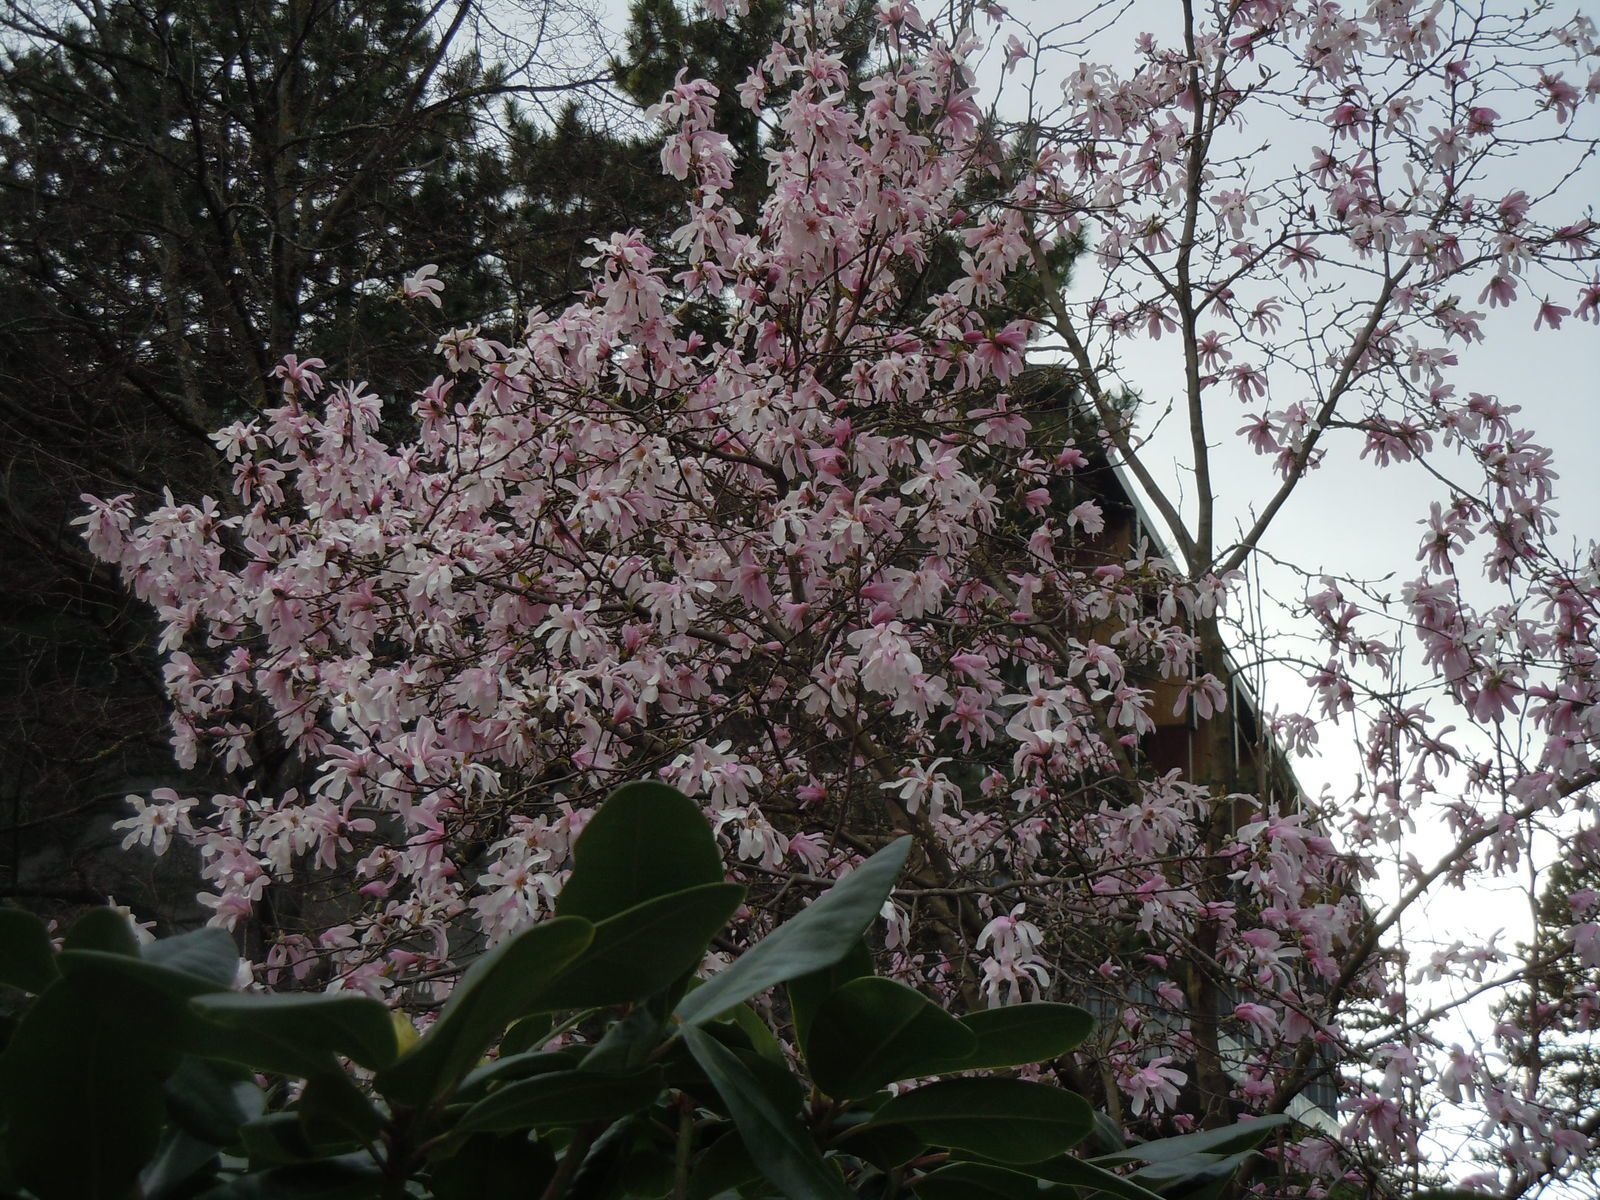 Magnolia (j'adore cet arbre)